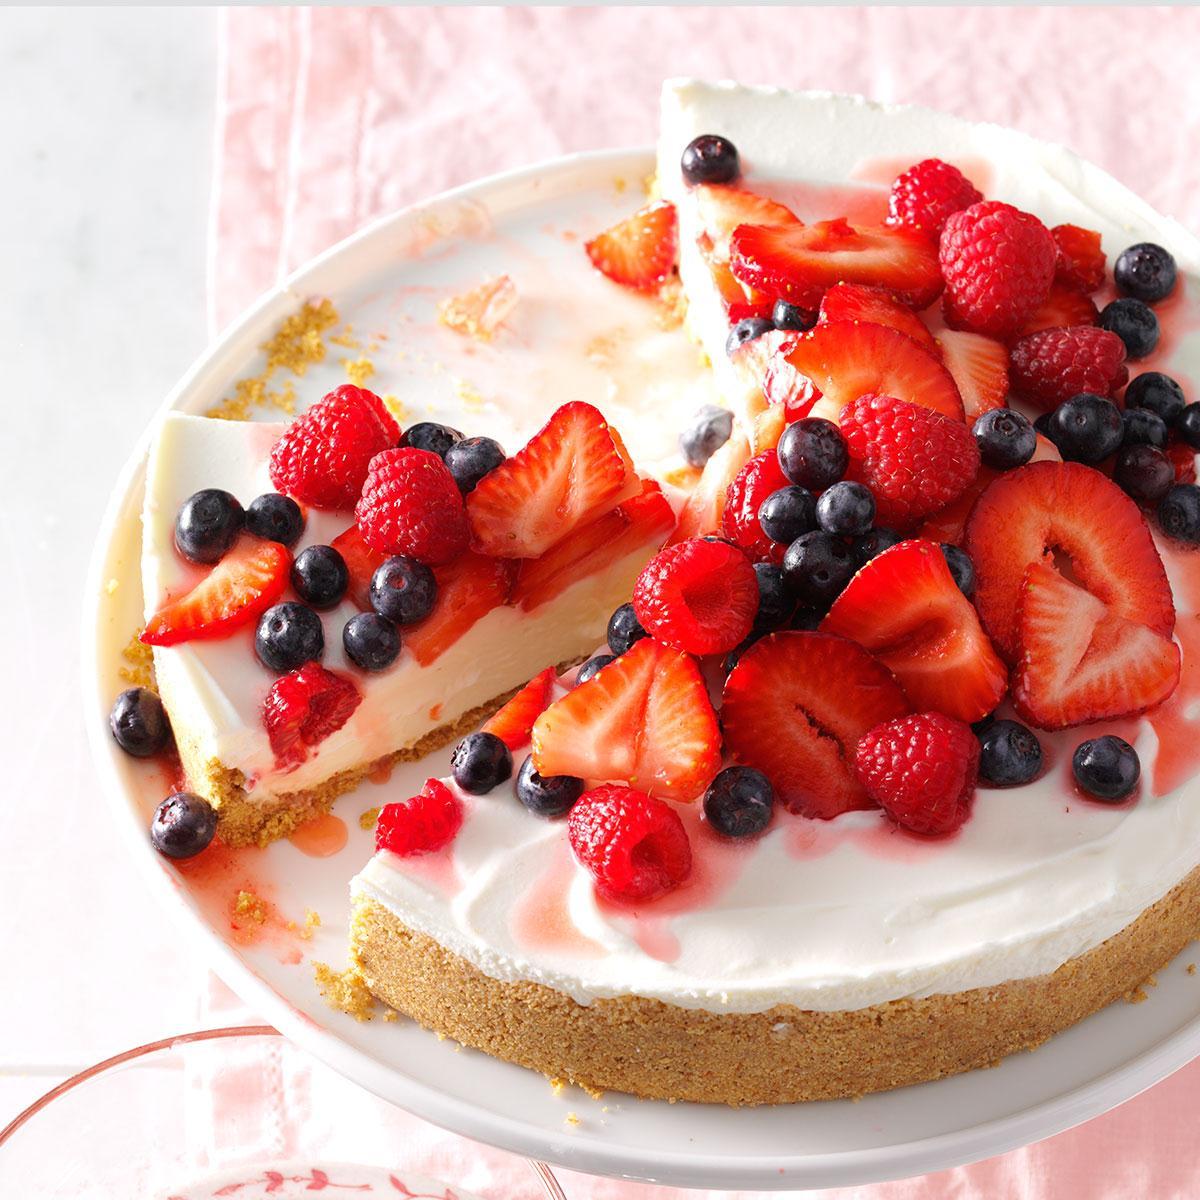 Easter dessert no bake cheesecake